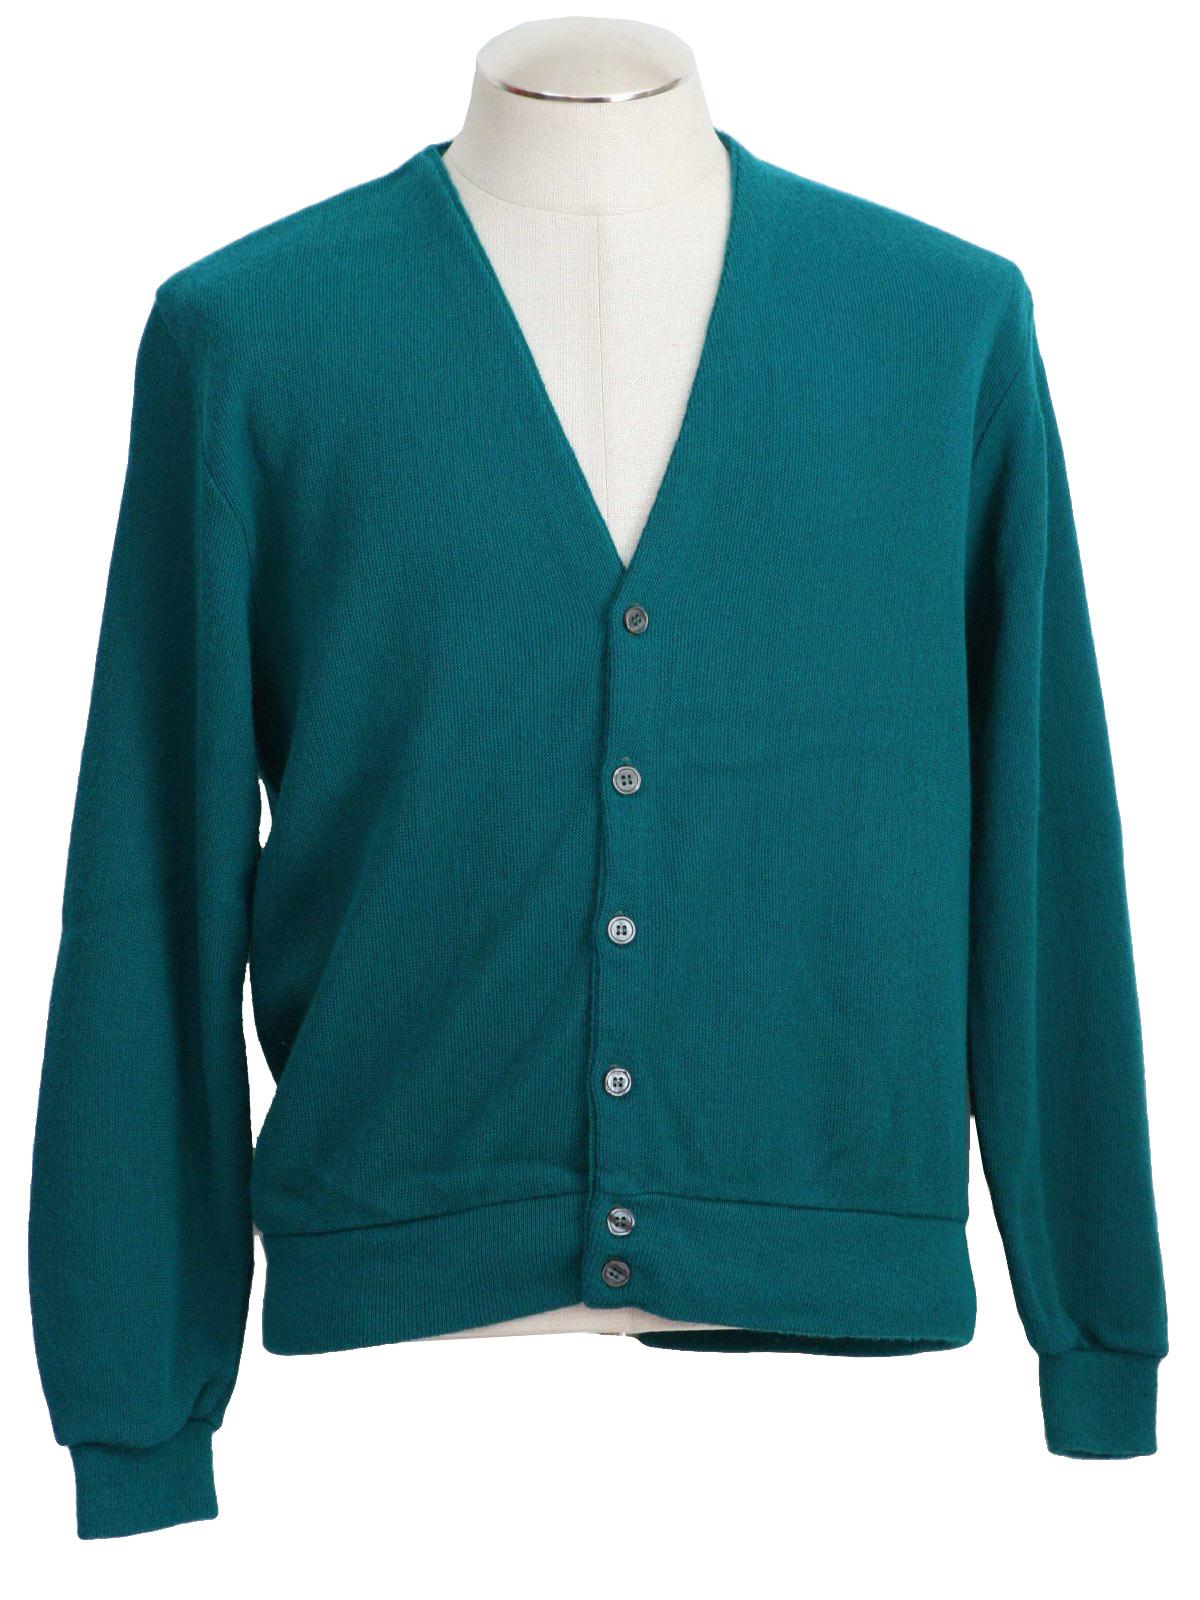 Pine State 80 S Vintage Caridgan Sweater 80s Pine State